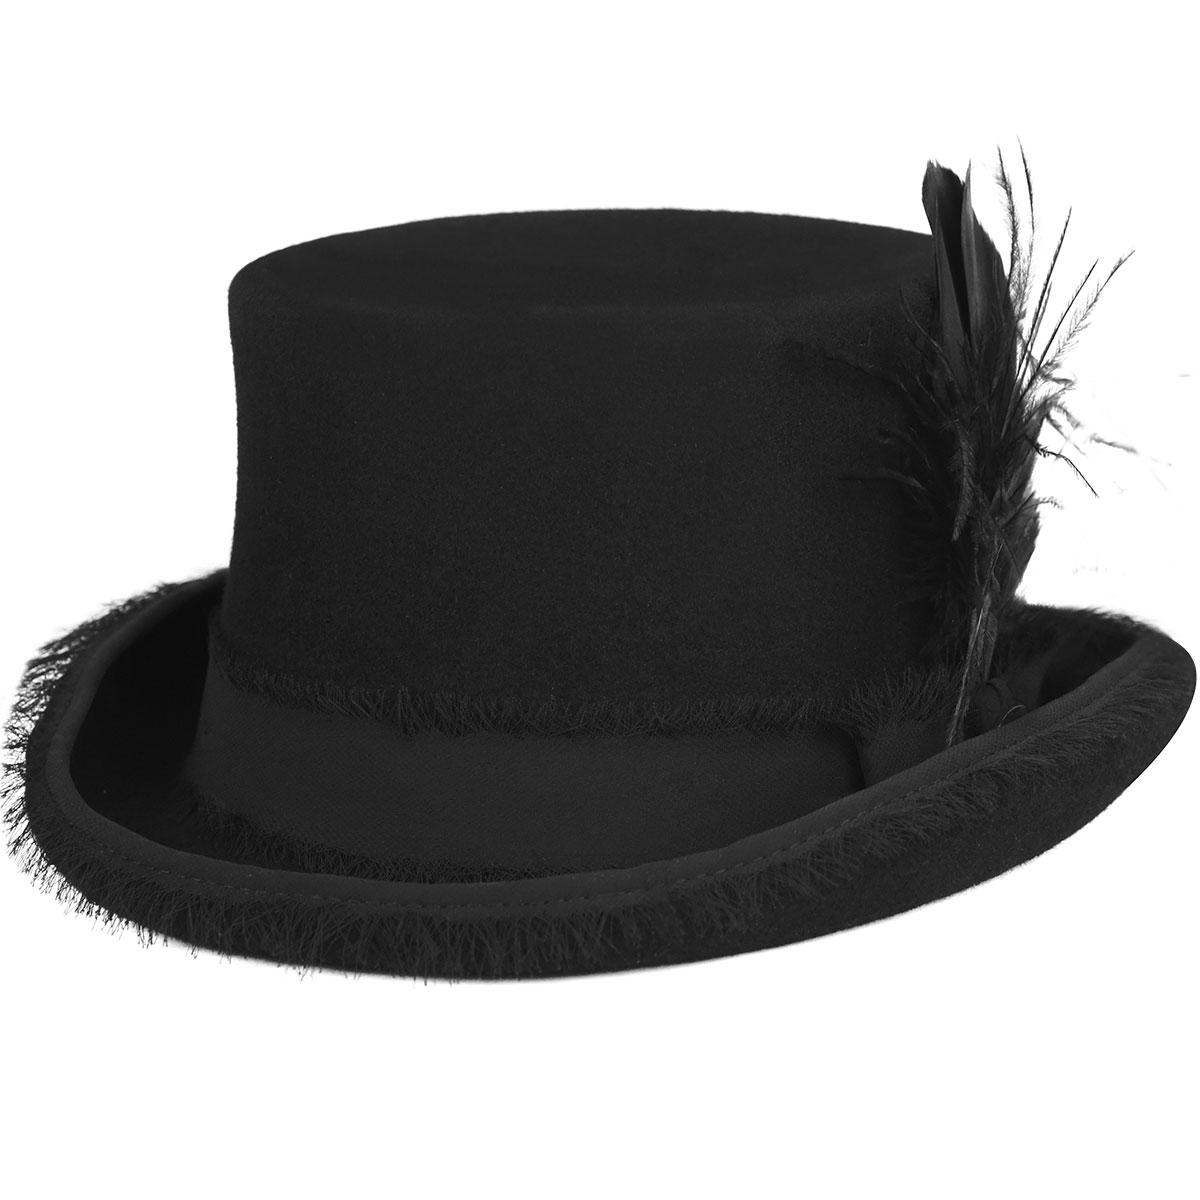 Renegade Renegade by Bailey Vivienne Top Hat in Black